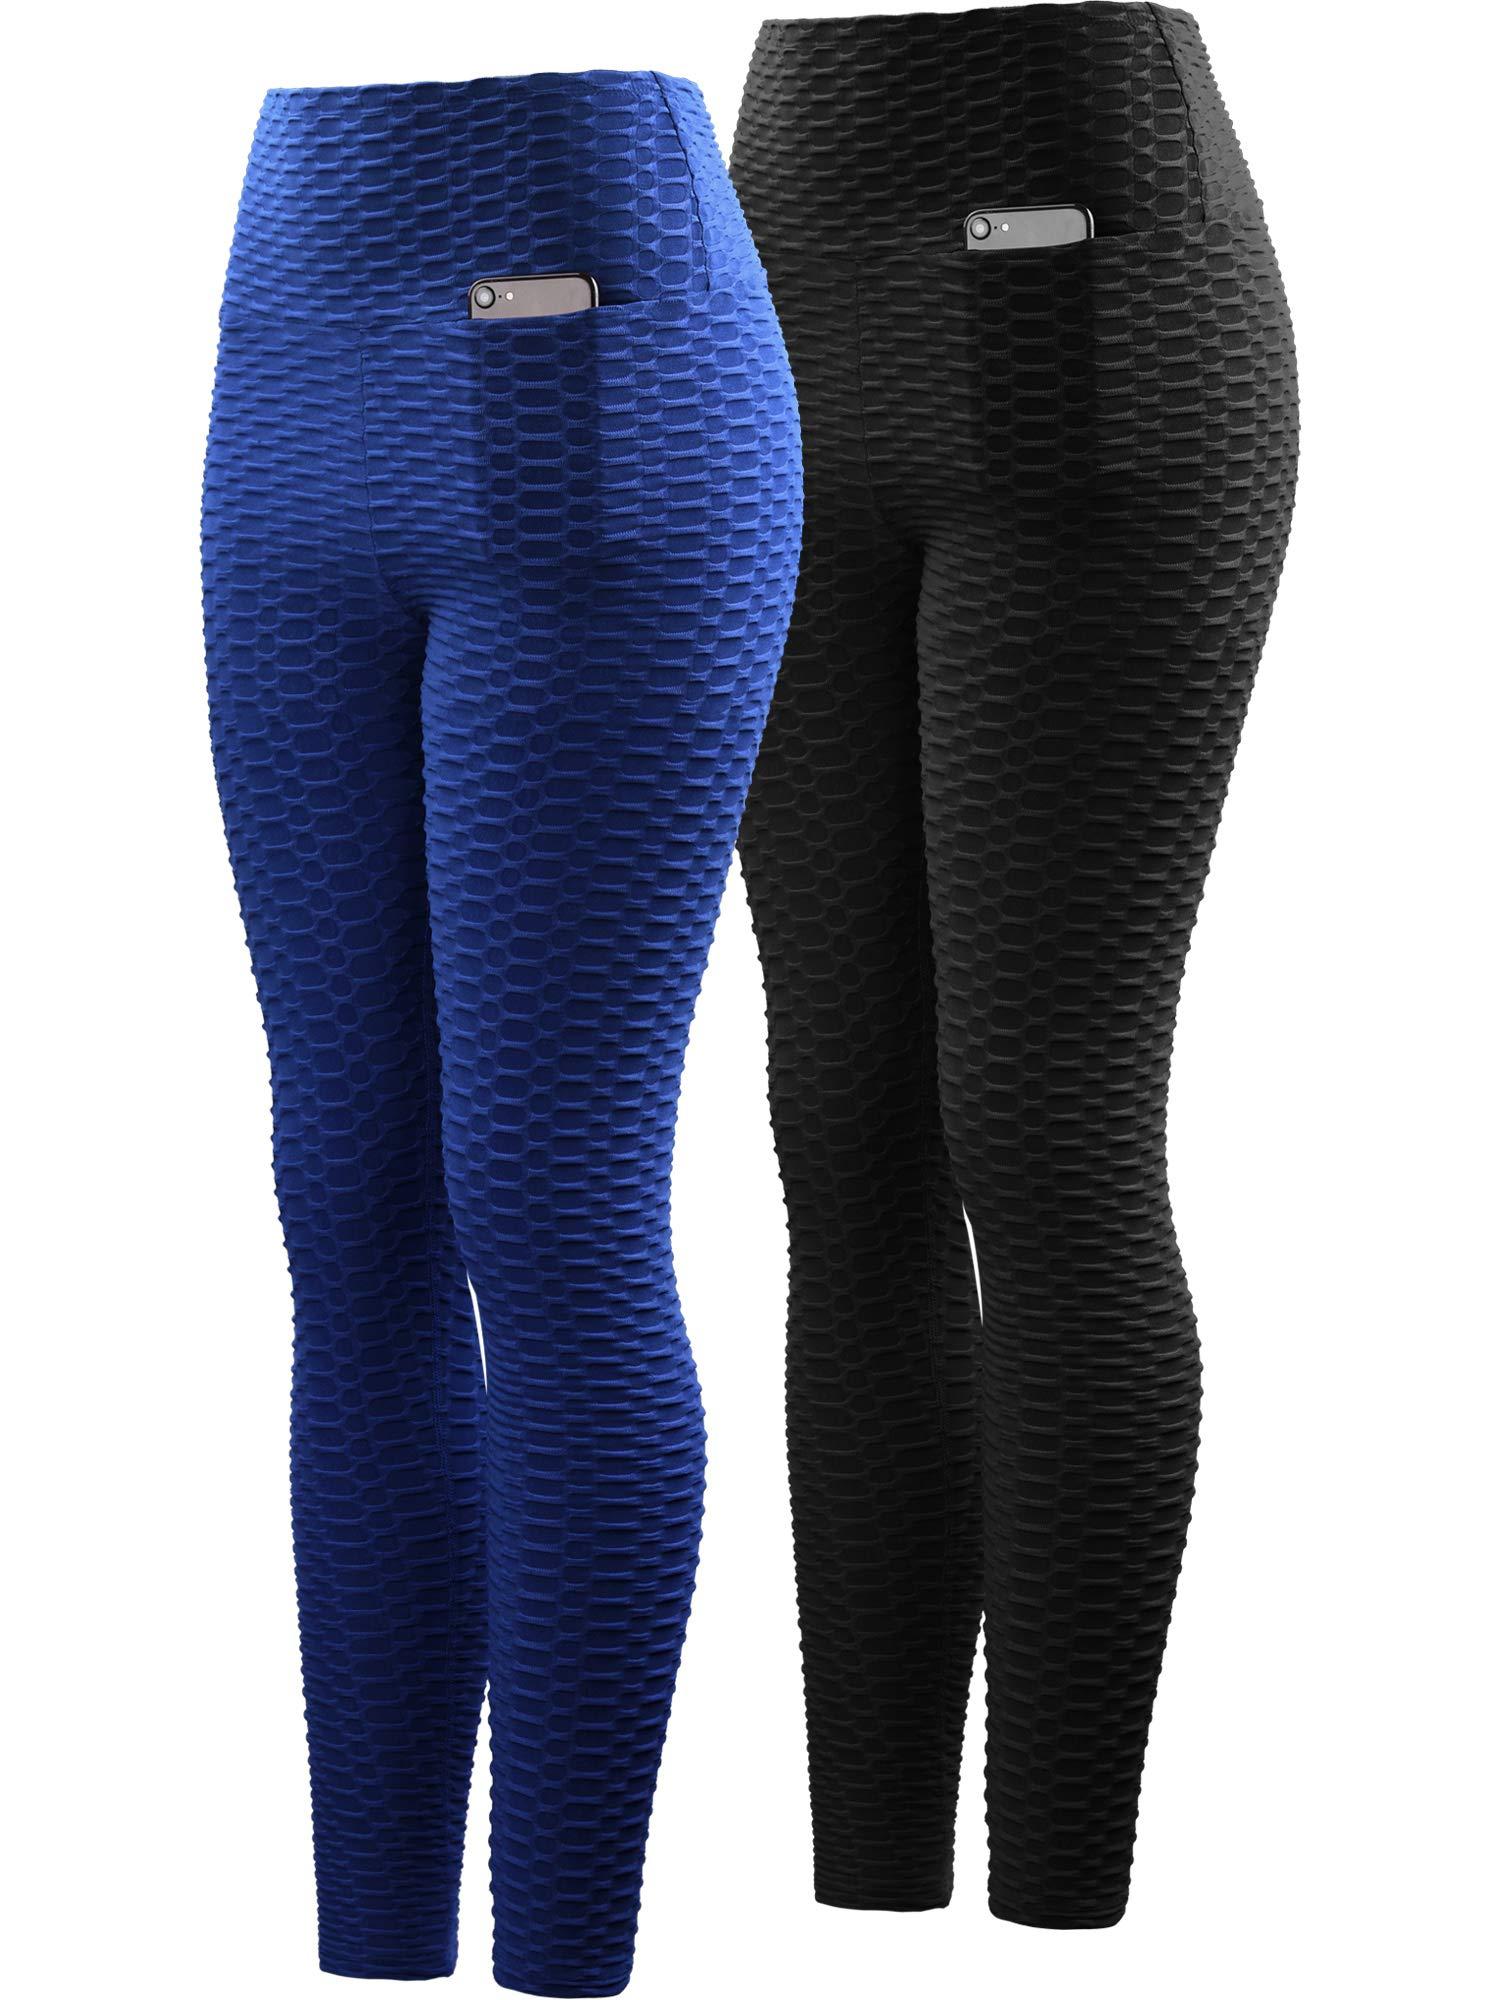 Neleus Women's 2 Pack Tummy Control High Waist Leggings Out Pocket,9036,Black/Blue,S,EU M by Neleus (Image #1)